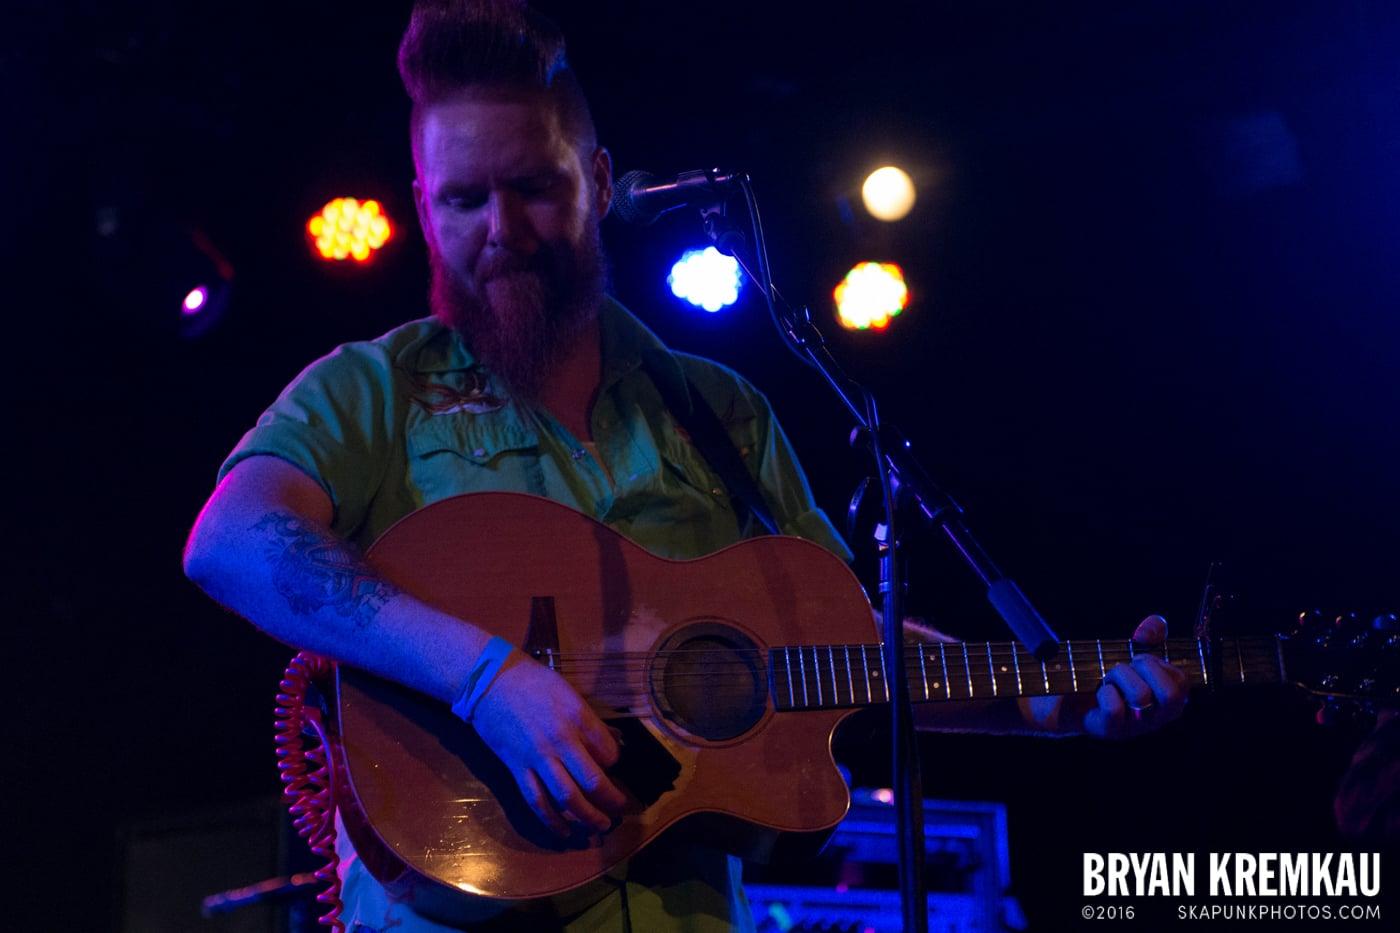 Danny Burns Band @ Knitting Factory, Brooklyn, NY - 9.10.14 (5)